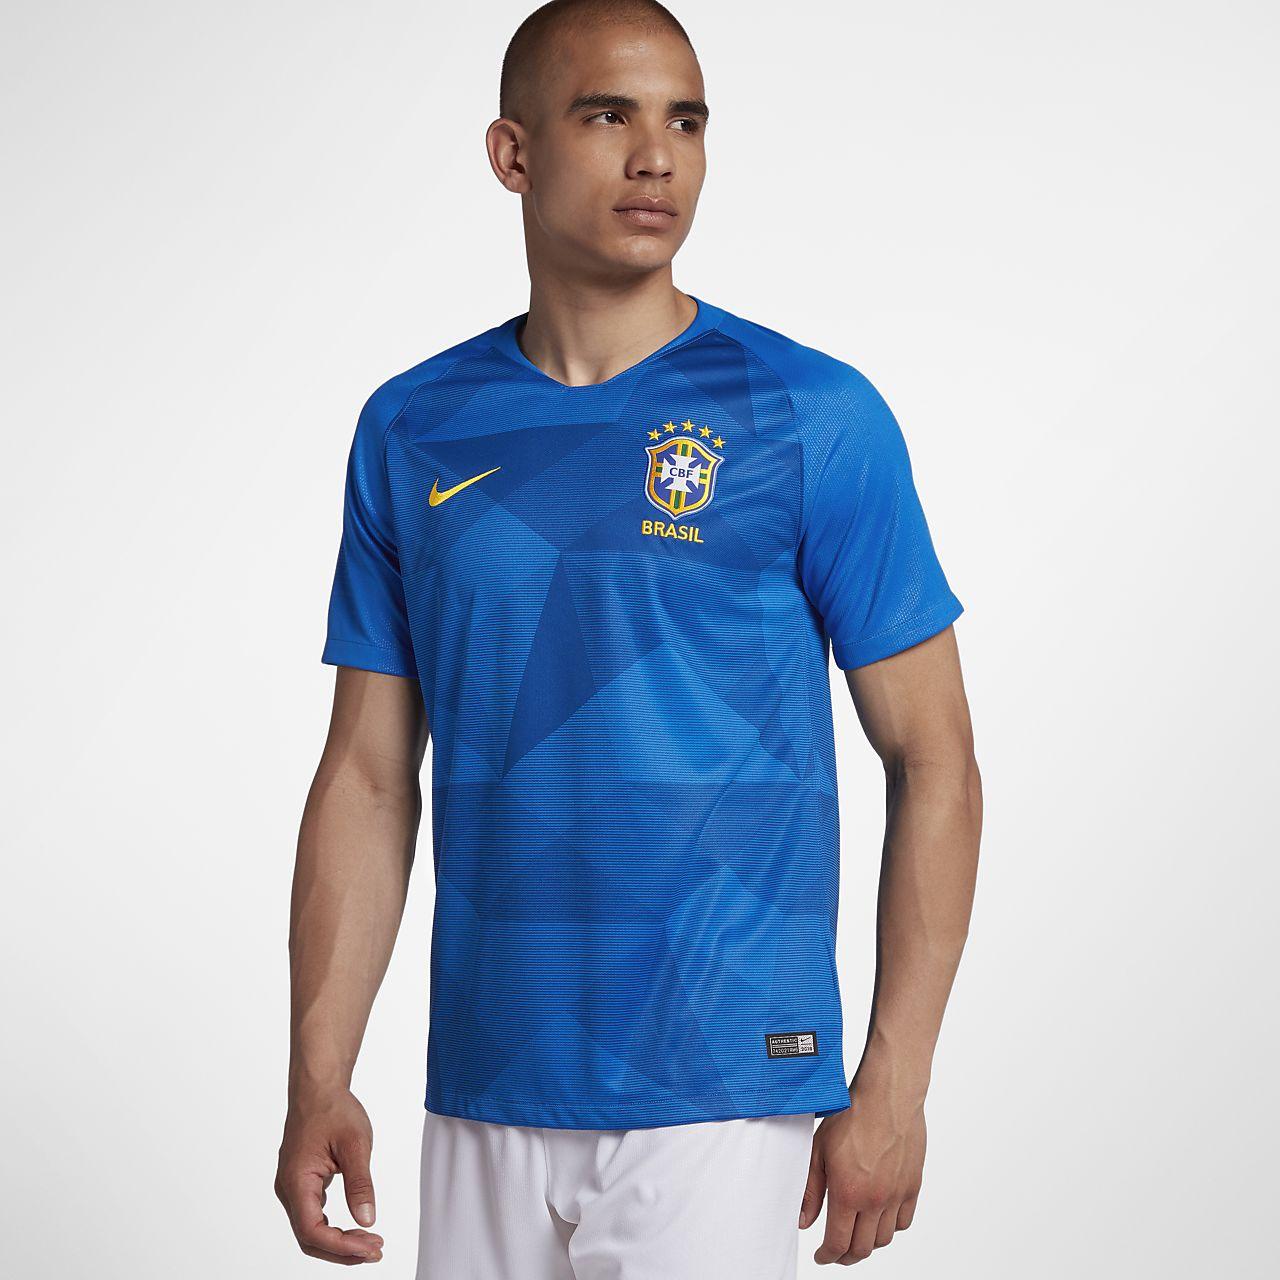 Camiseta de fútbol para hombre 2018 Brasil CBF Stadium Away